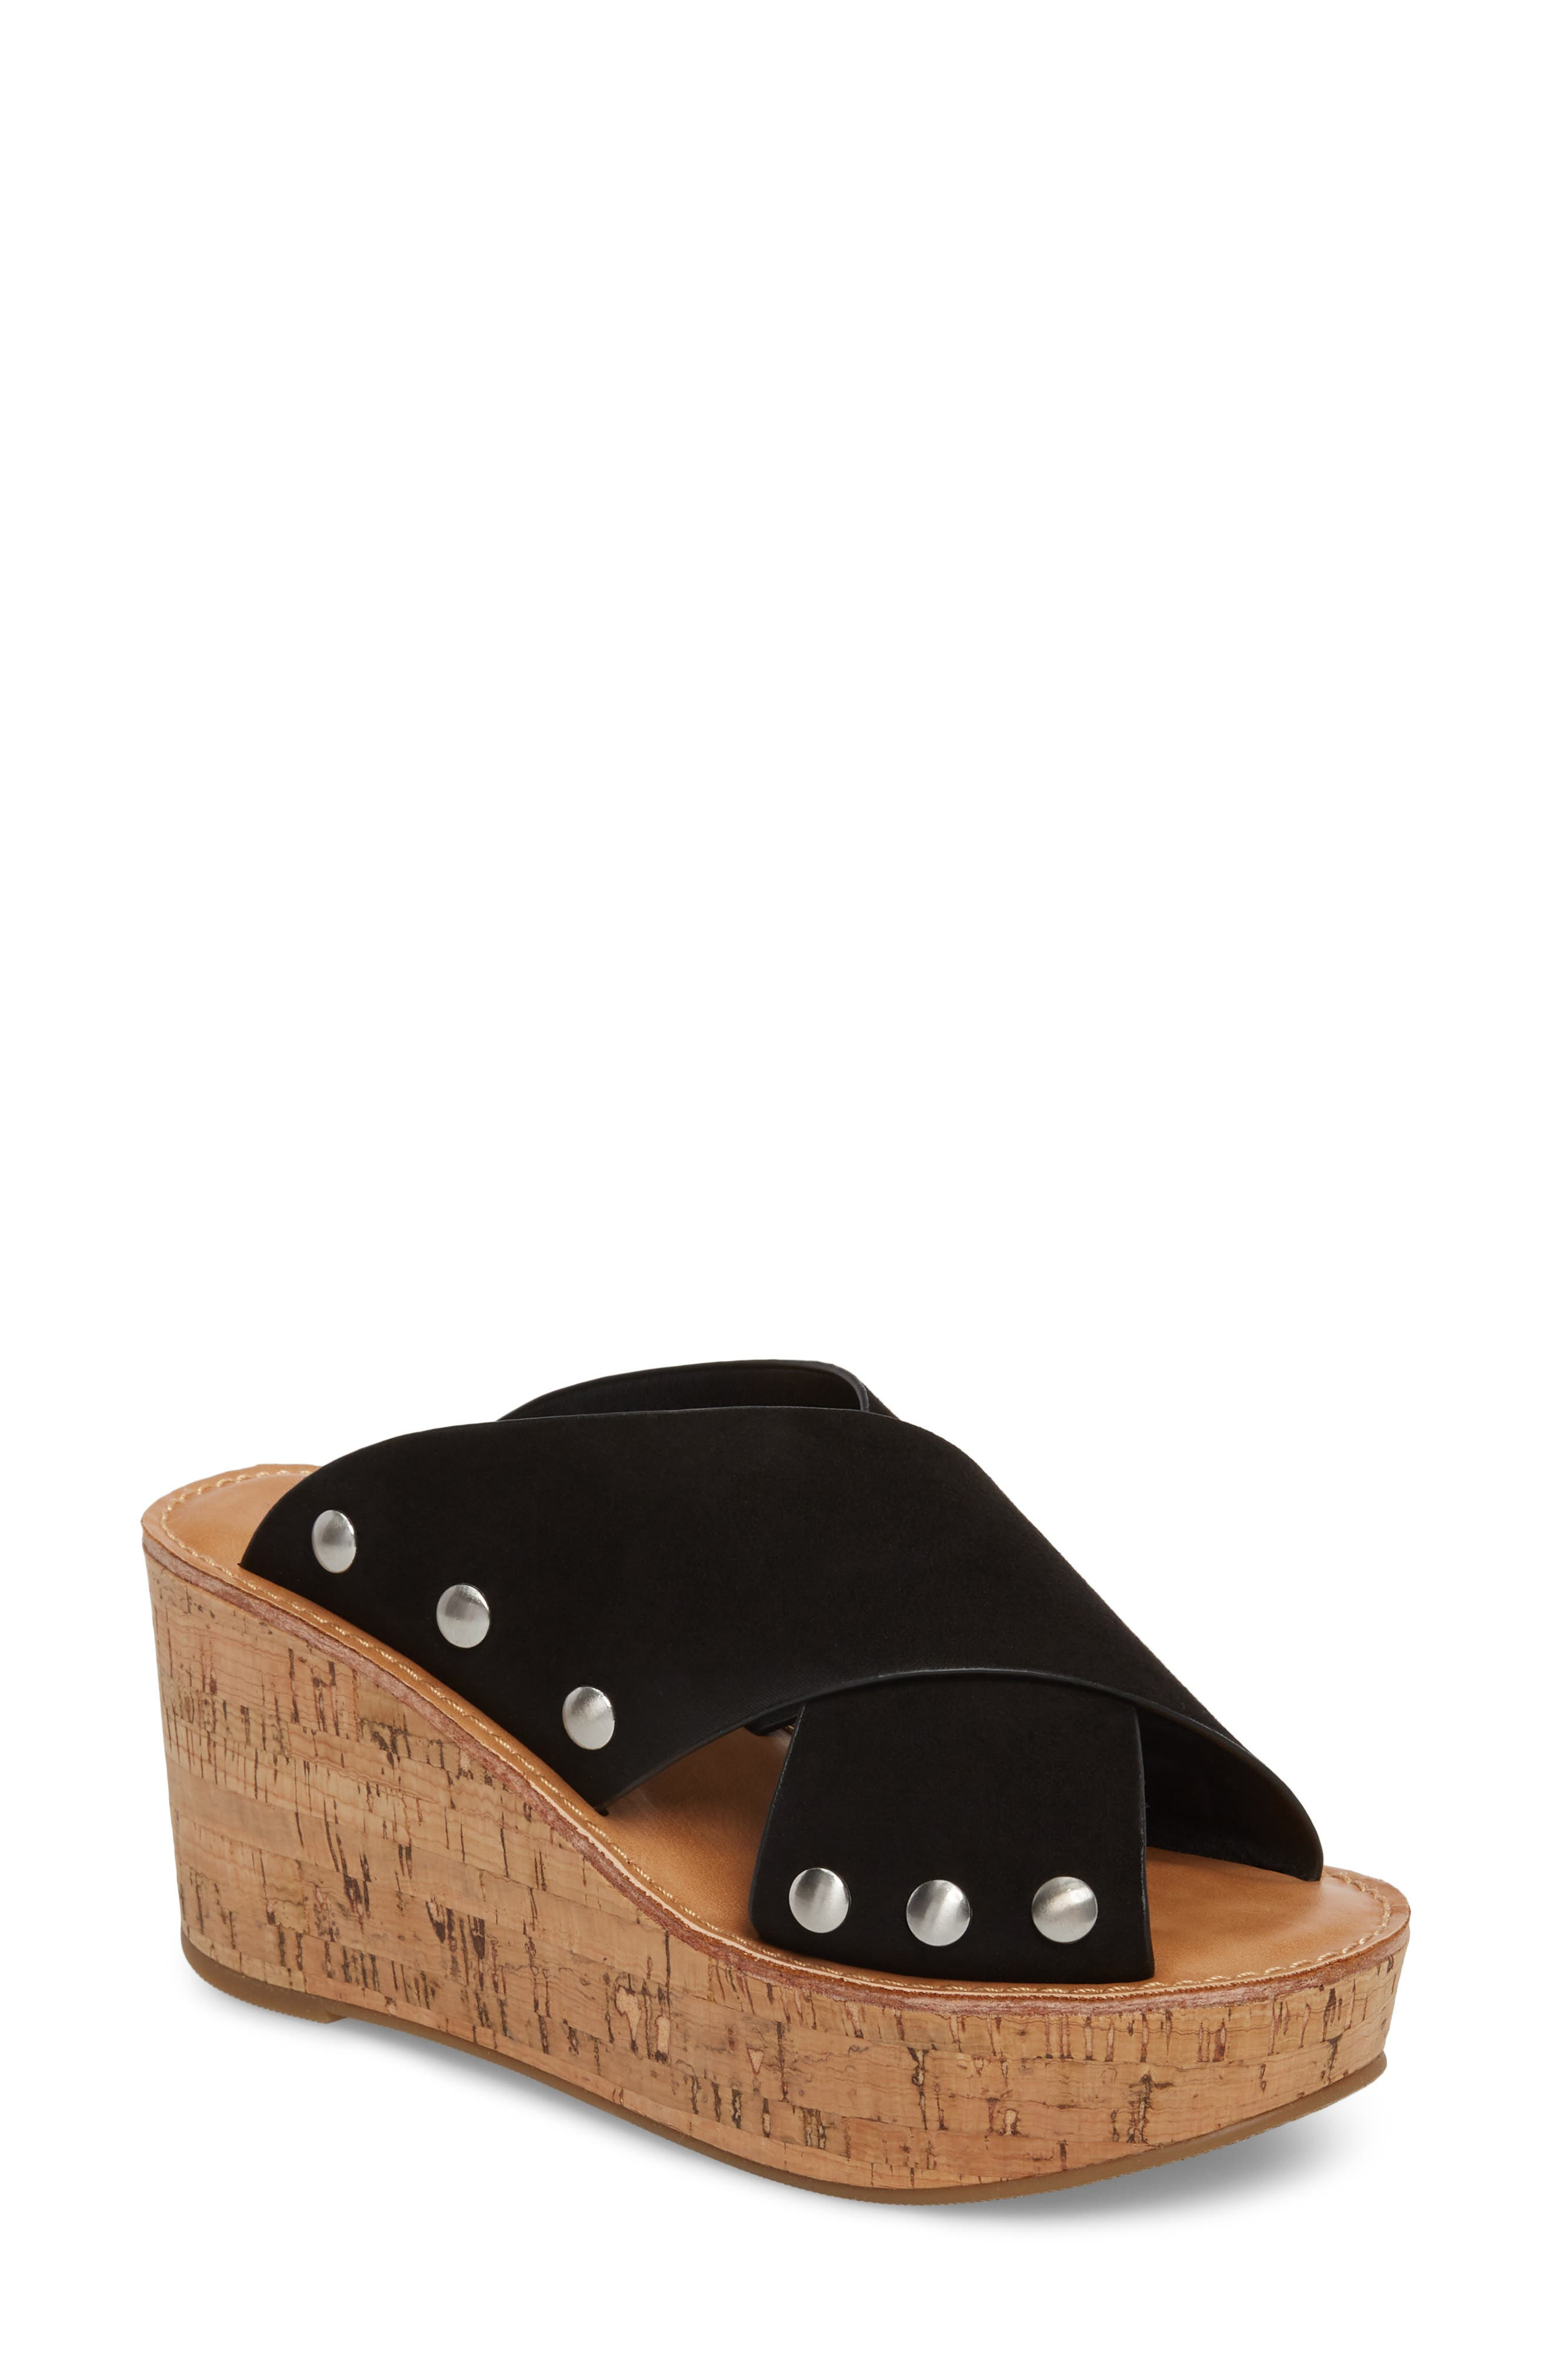 Oahu Platform Wedge Sandal,                             Main thumbnail 1, color,                             BLACK